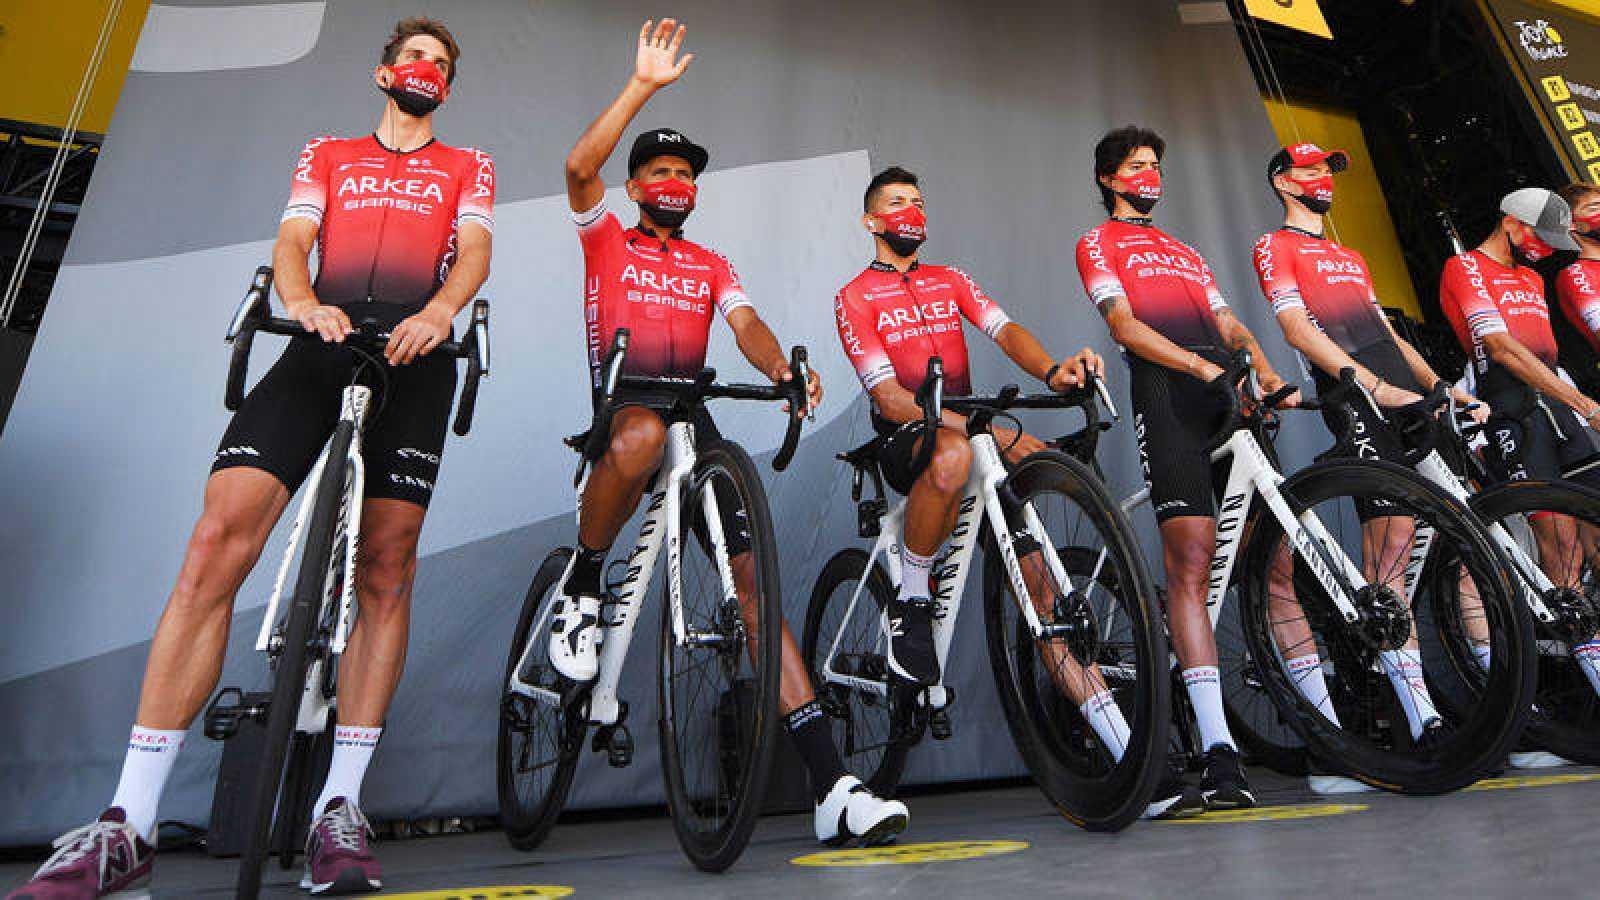 Ciclistas del Arkea antes de la 18ª etapa del Tour